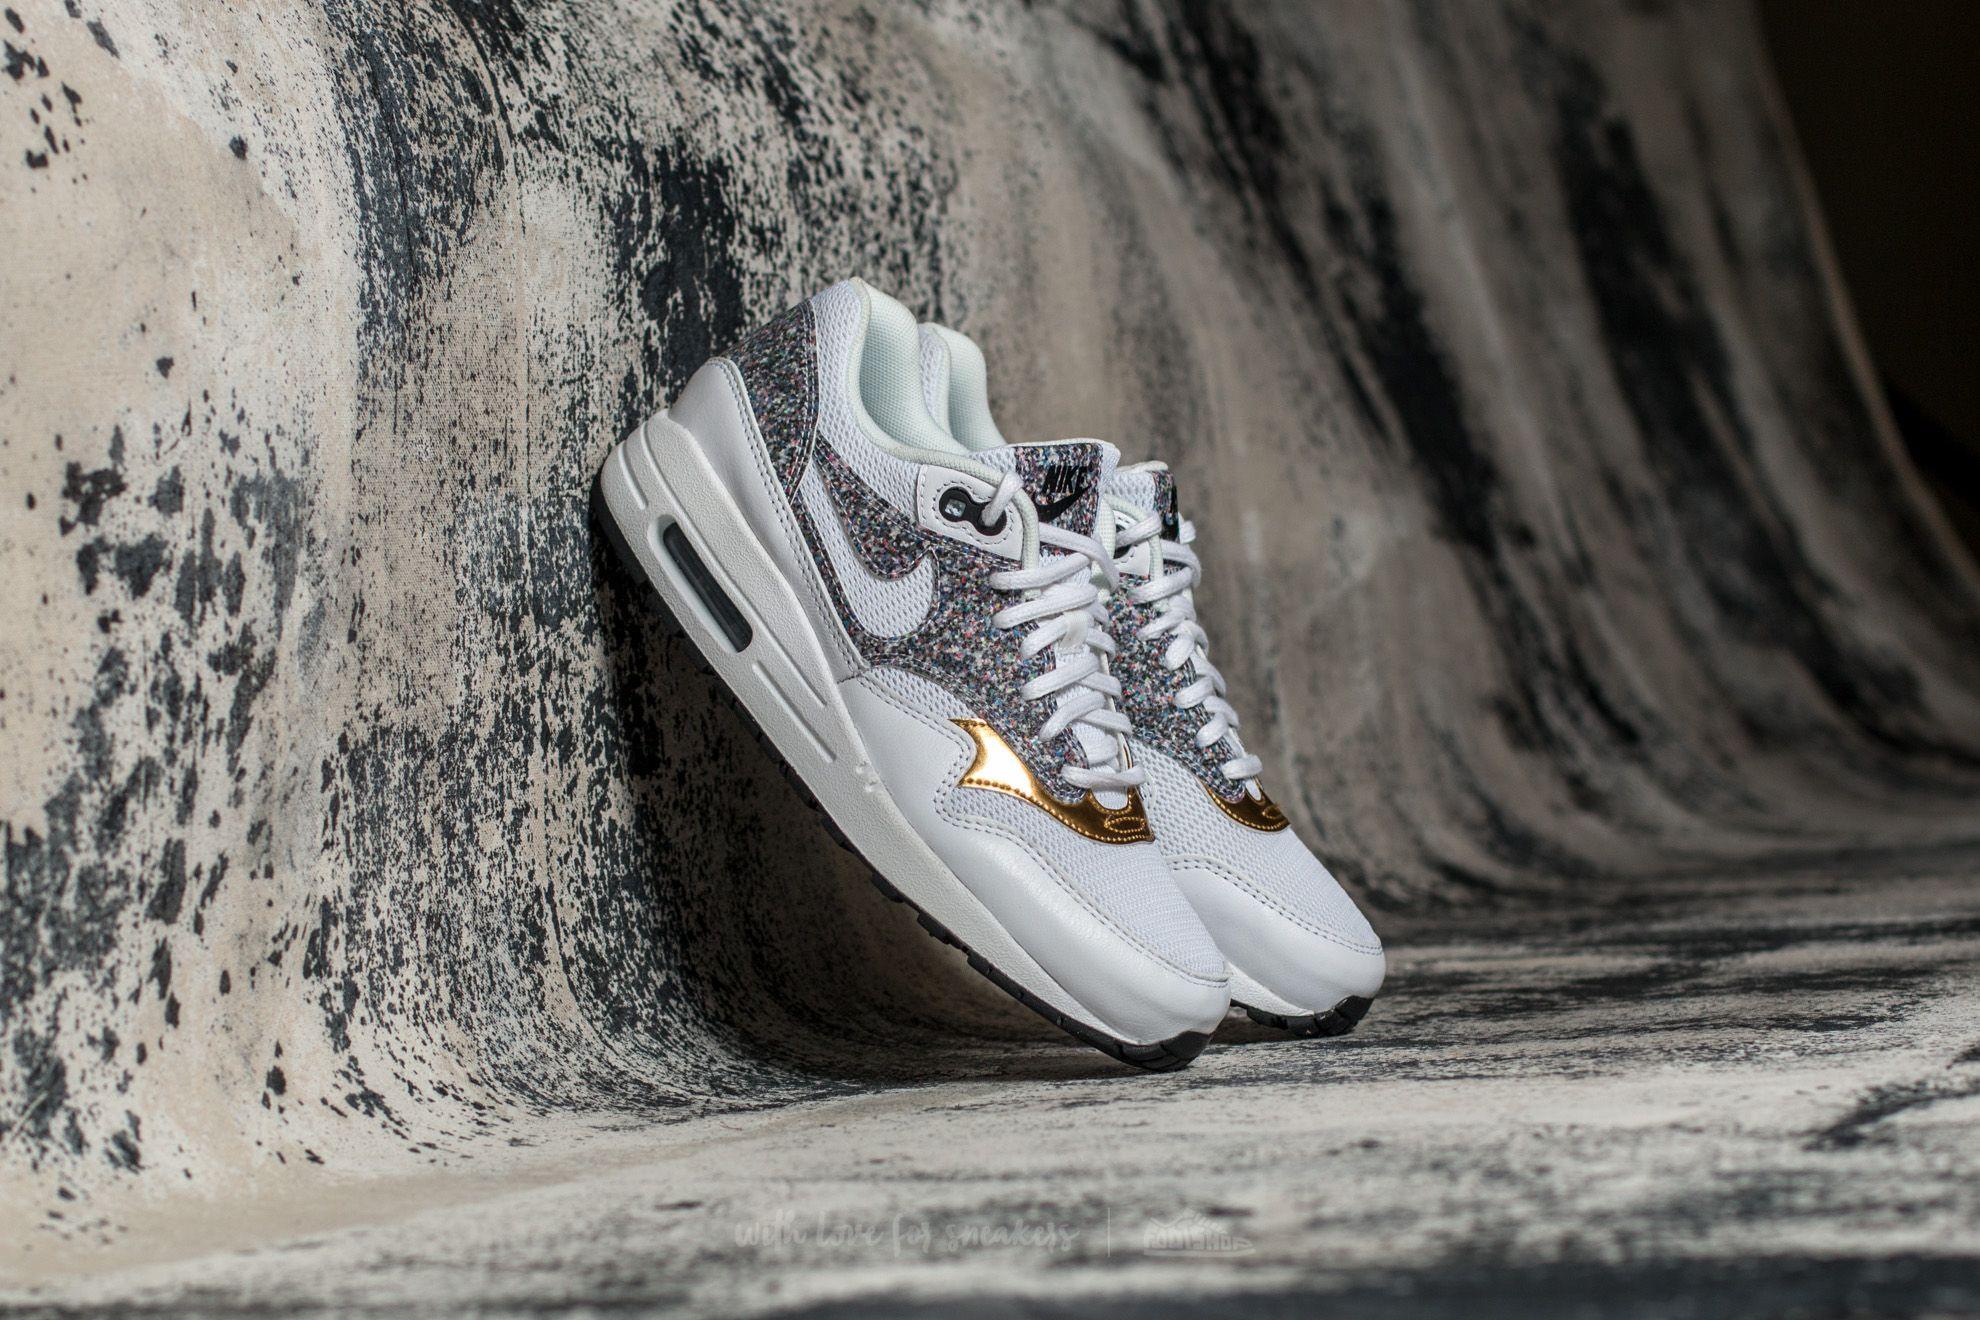 Nike Wmns Air Max 1 SE White/ White-Black